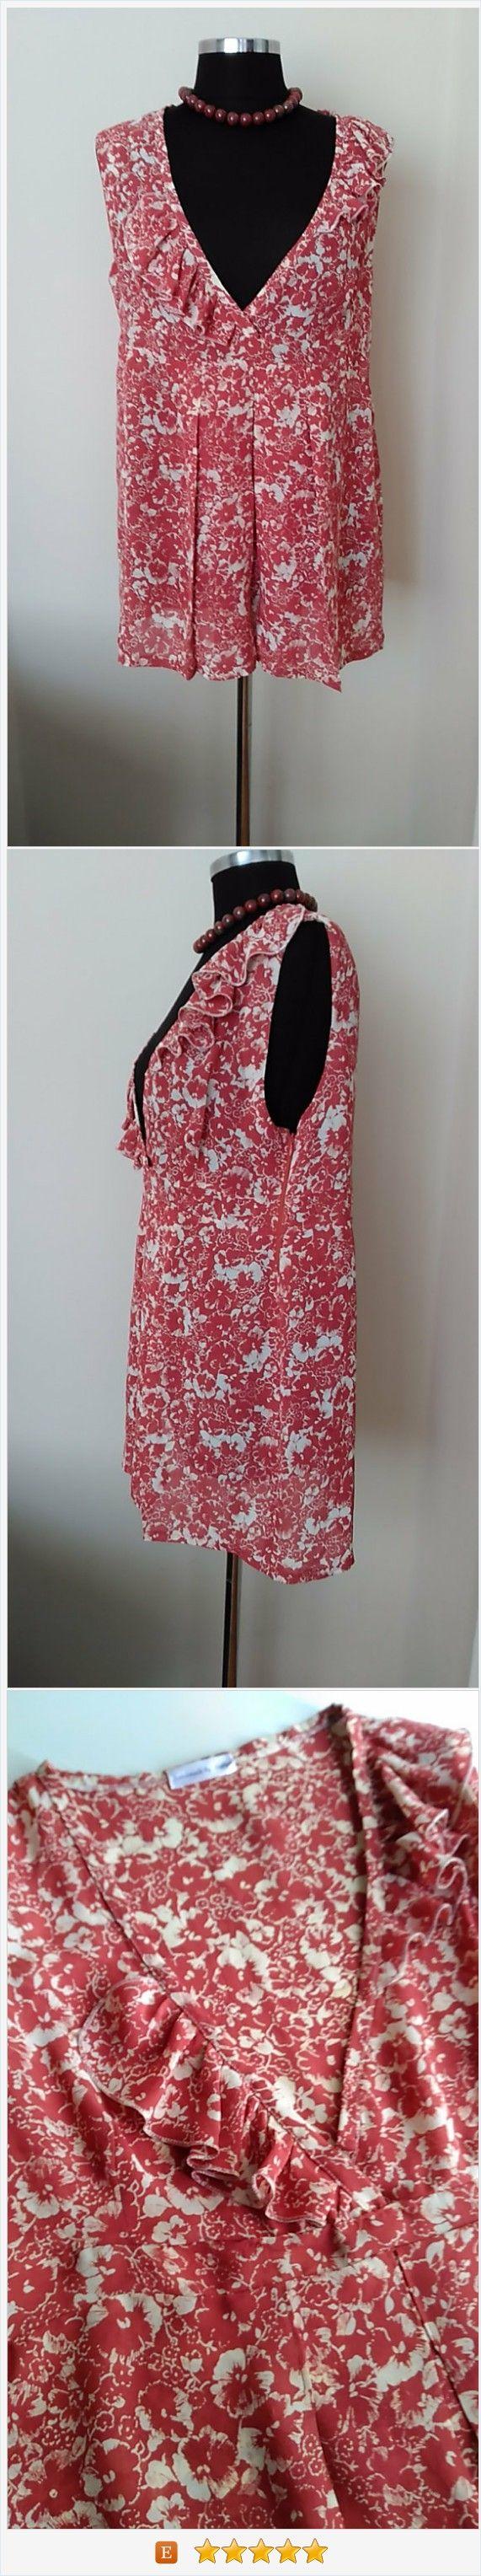 Plus size Clothing   Plus size Tunic     Maternity Tunic    Terra-Cotta&White Floral Print Top HandmadebyNadya https://www.etsy.com/listing/456830528/